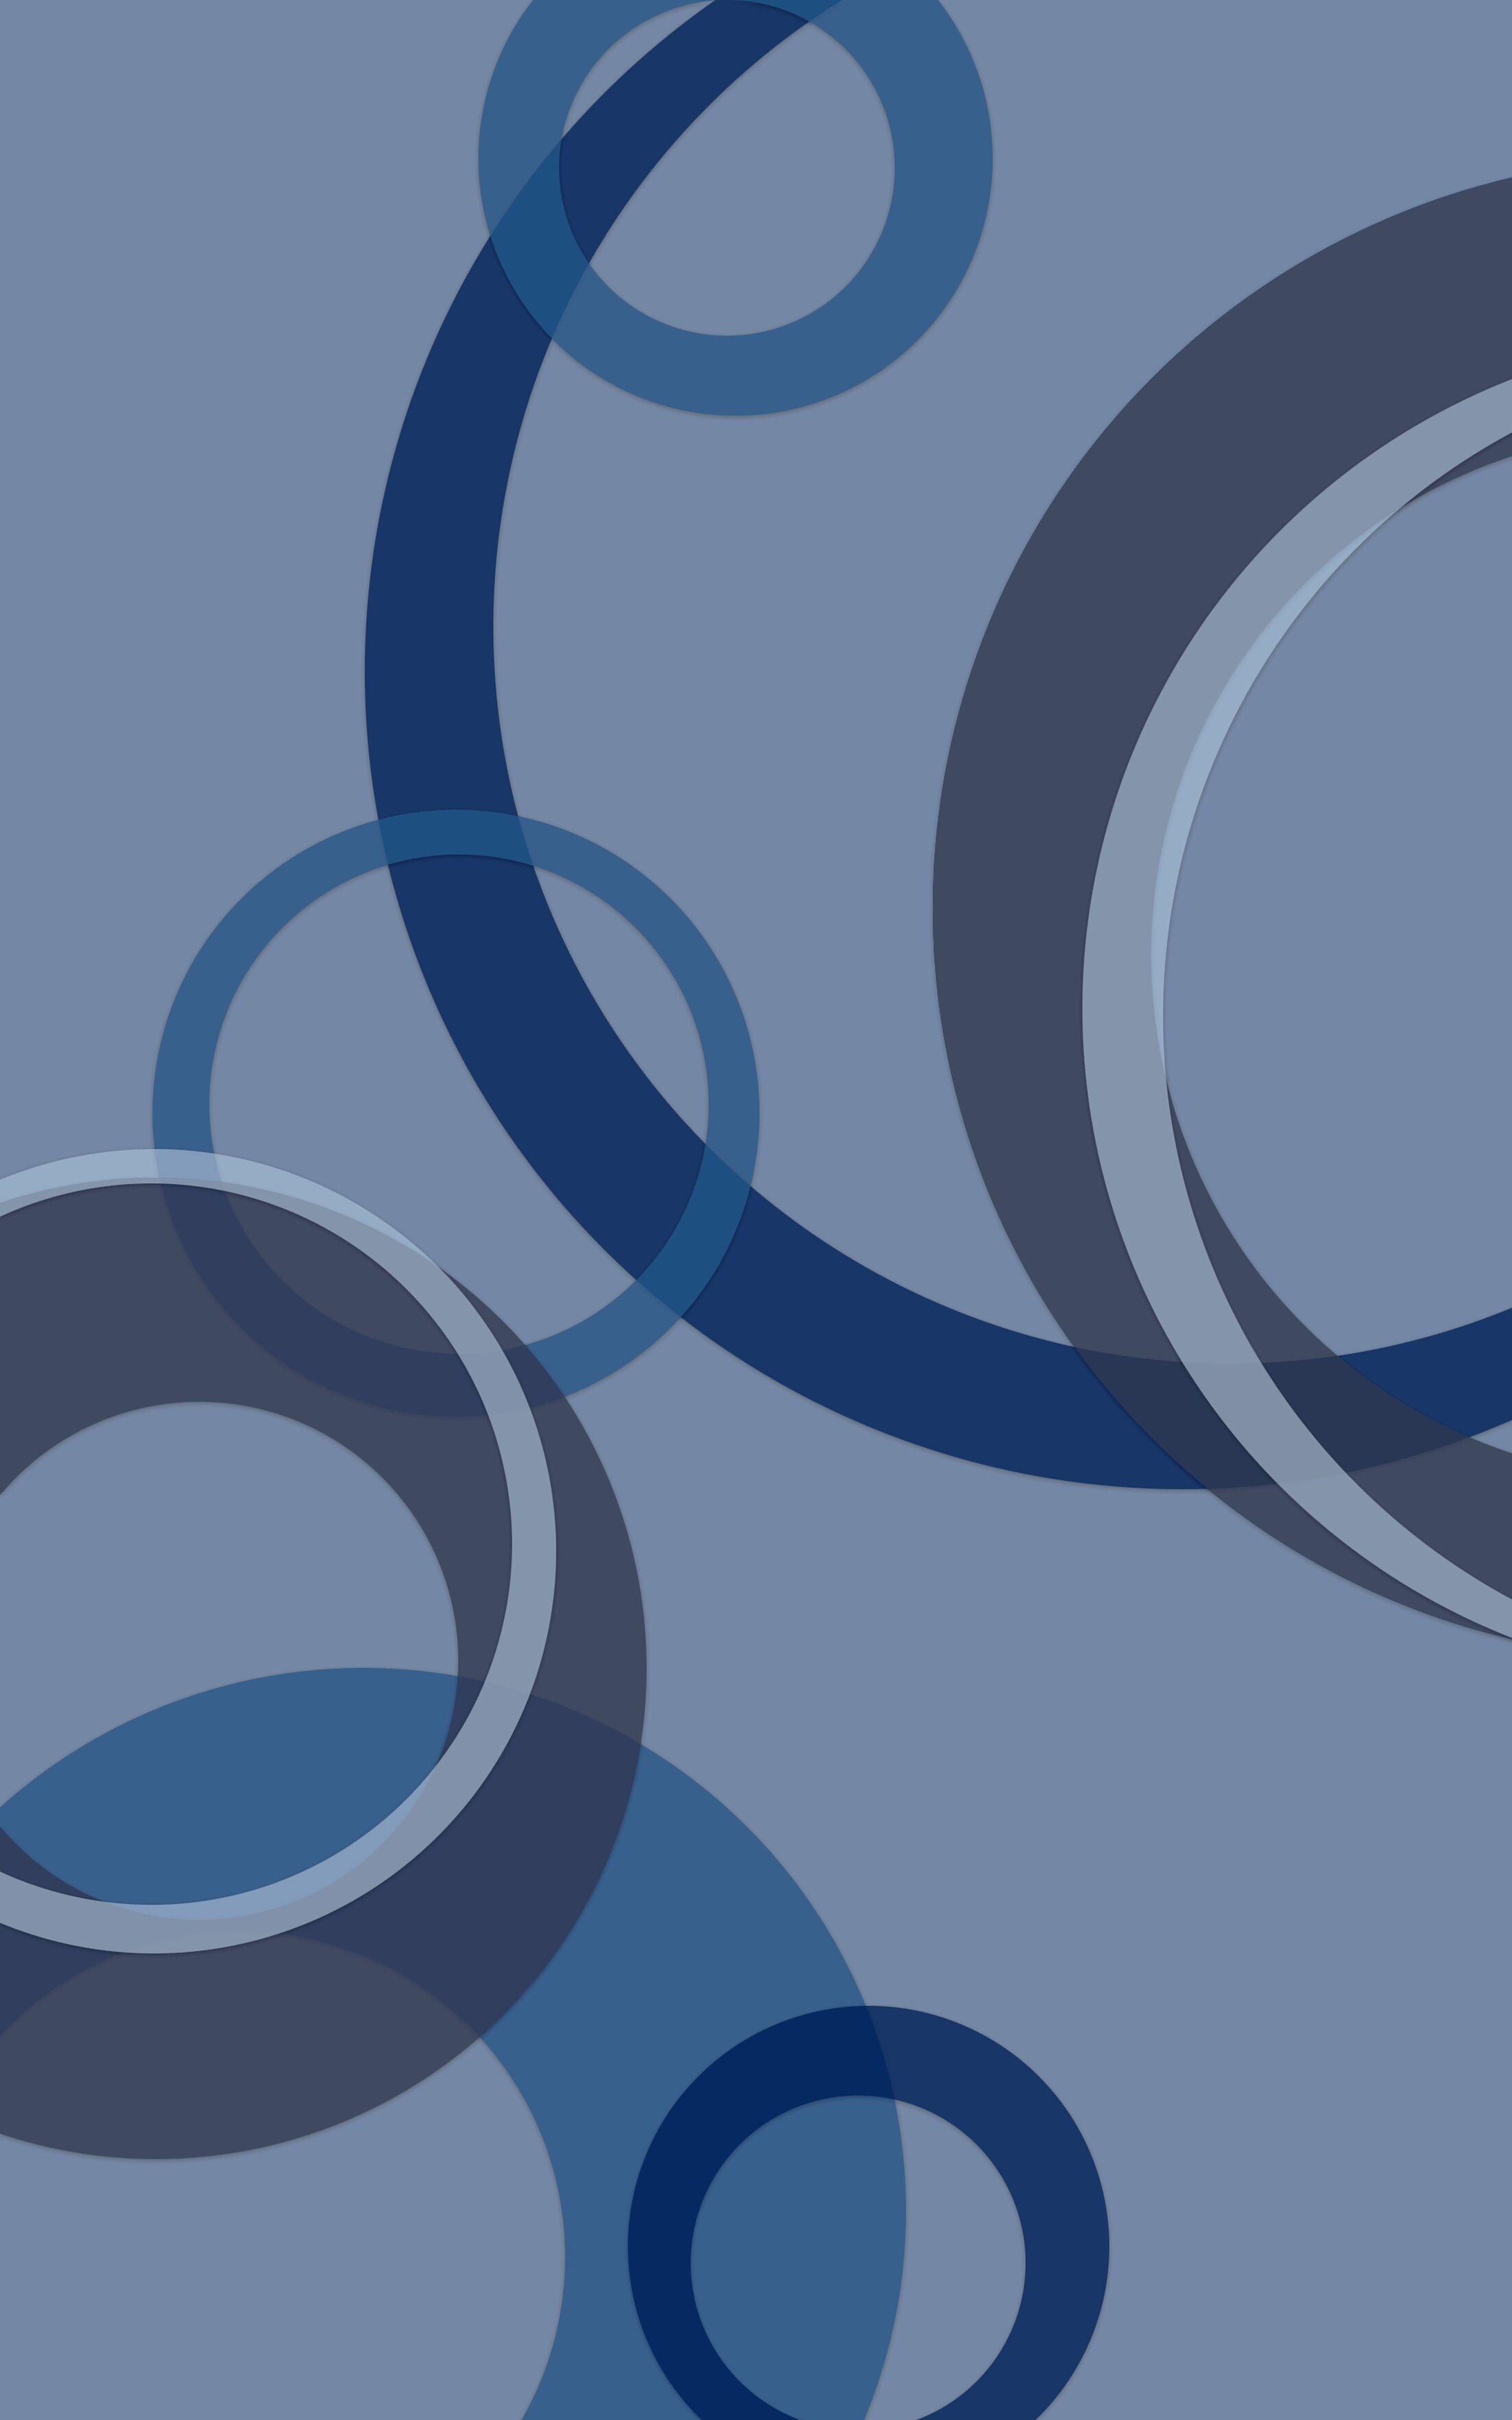 Jakarta Contemporary Geometric Blue Area Rug Rug Size: Rectangle 7'6